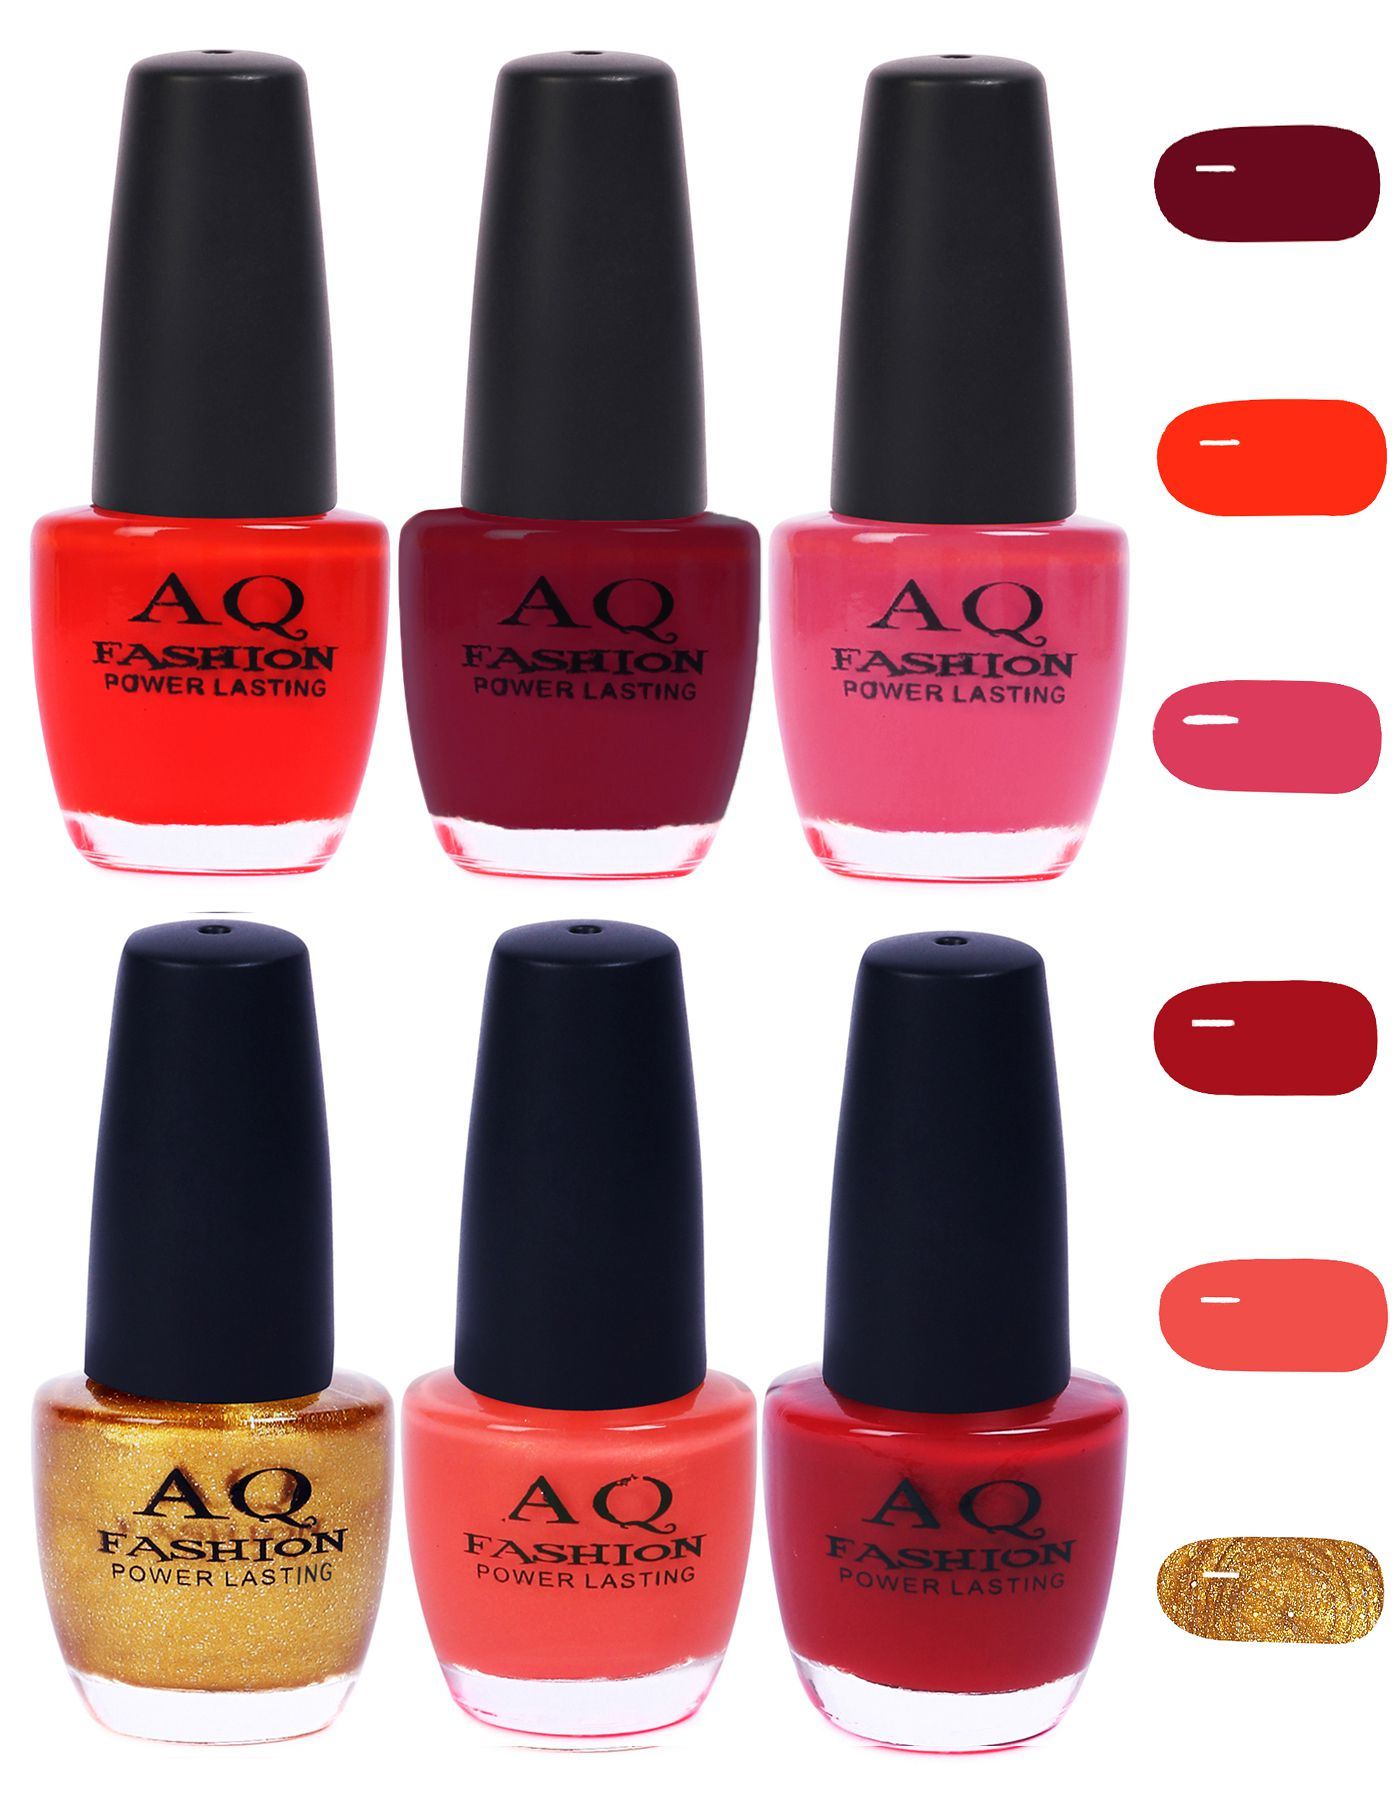 AQ Fashion Nail Polish Classic Shades Matte 72 ml